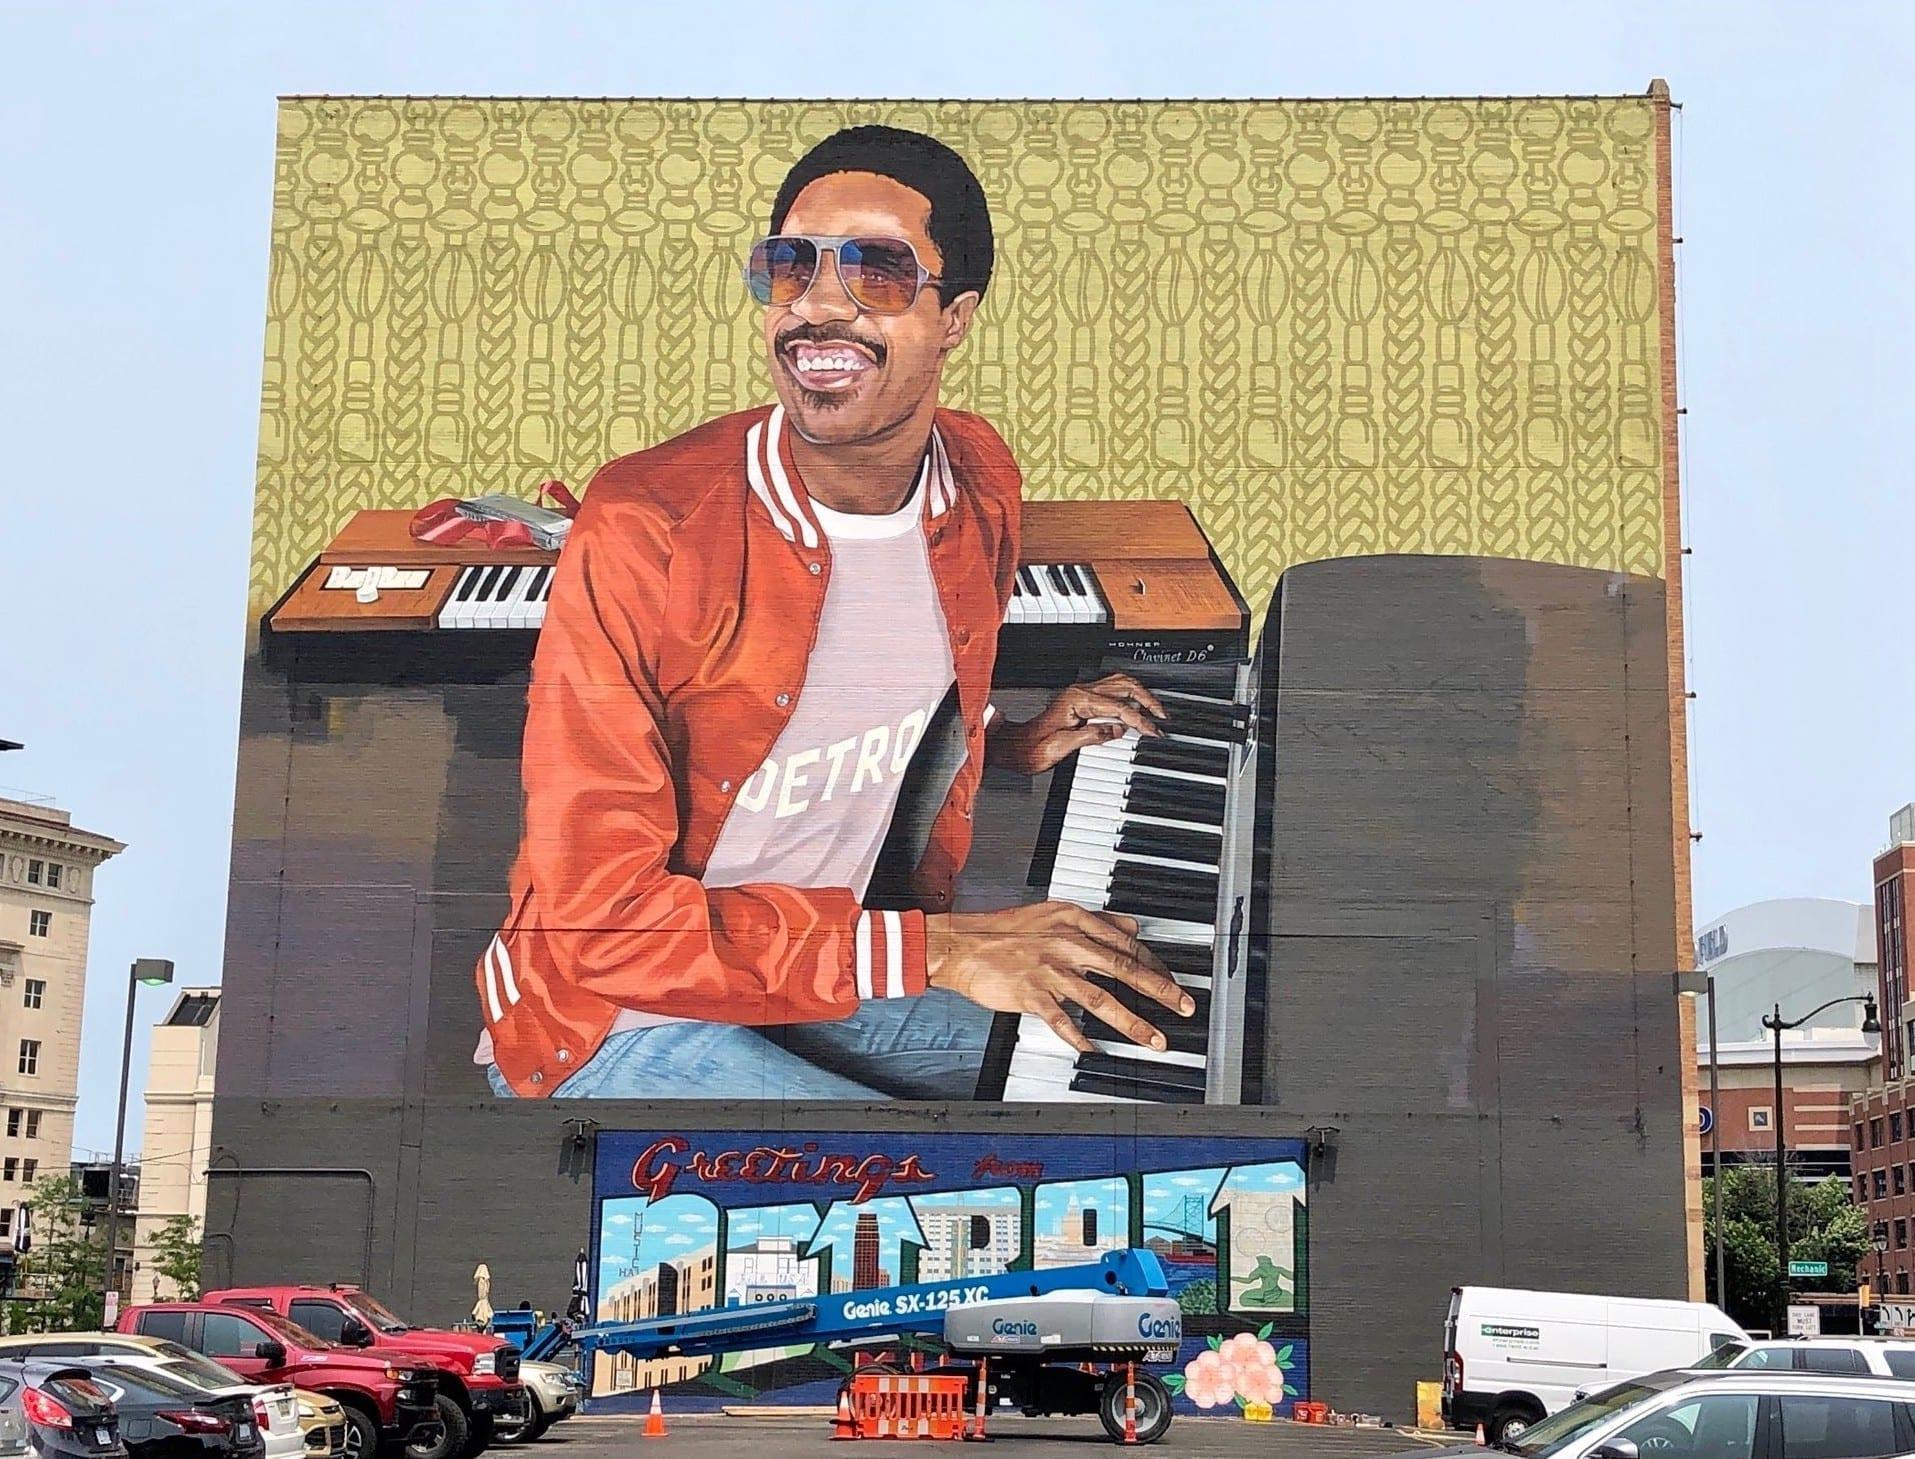 Stevie Wonder mural